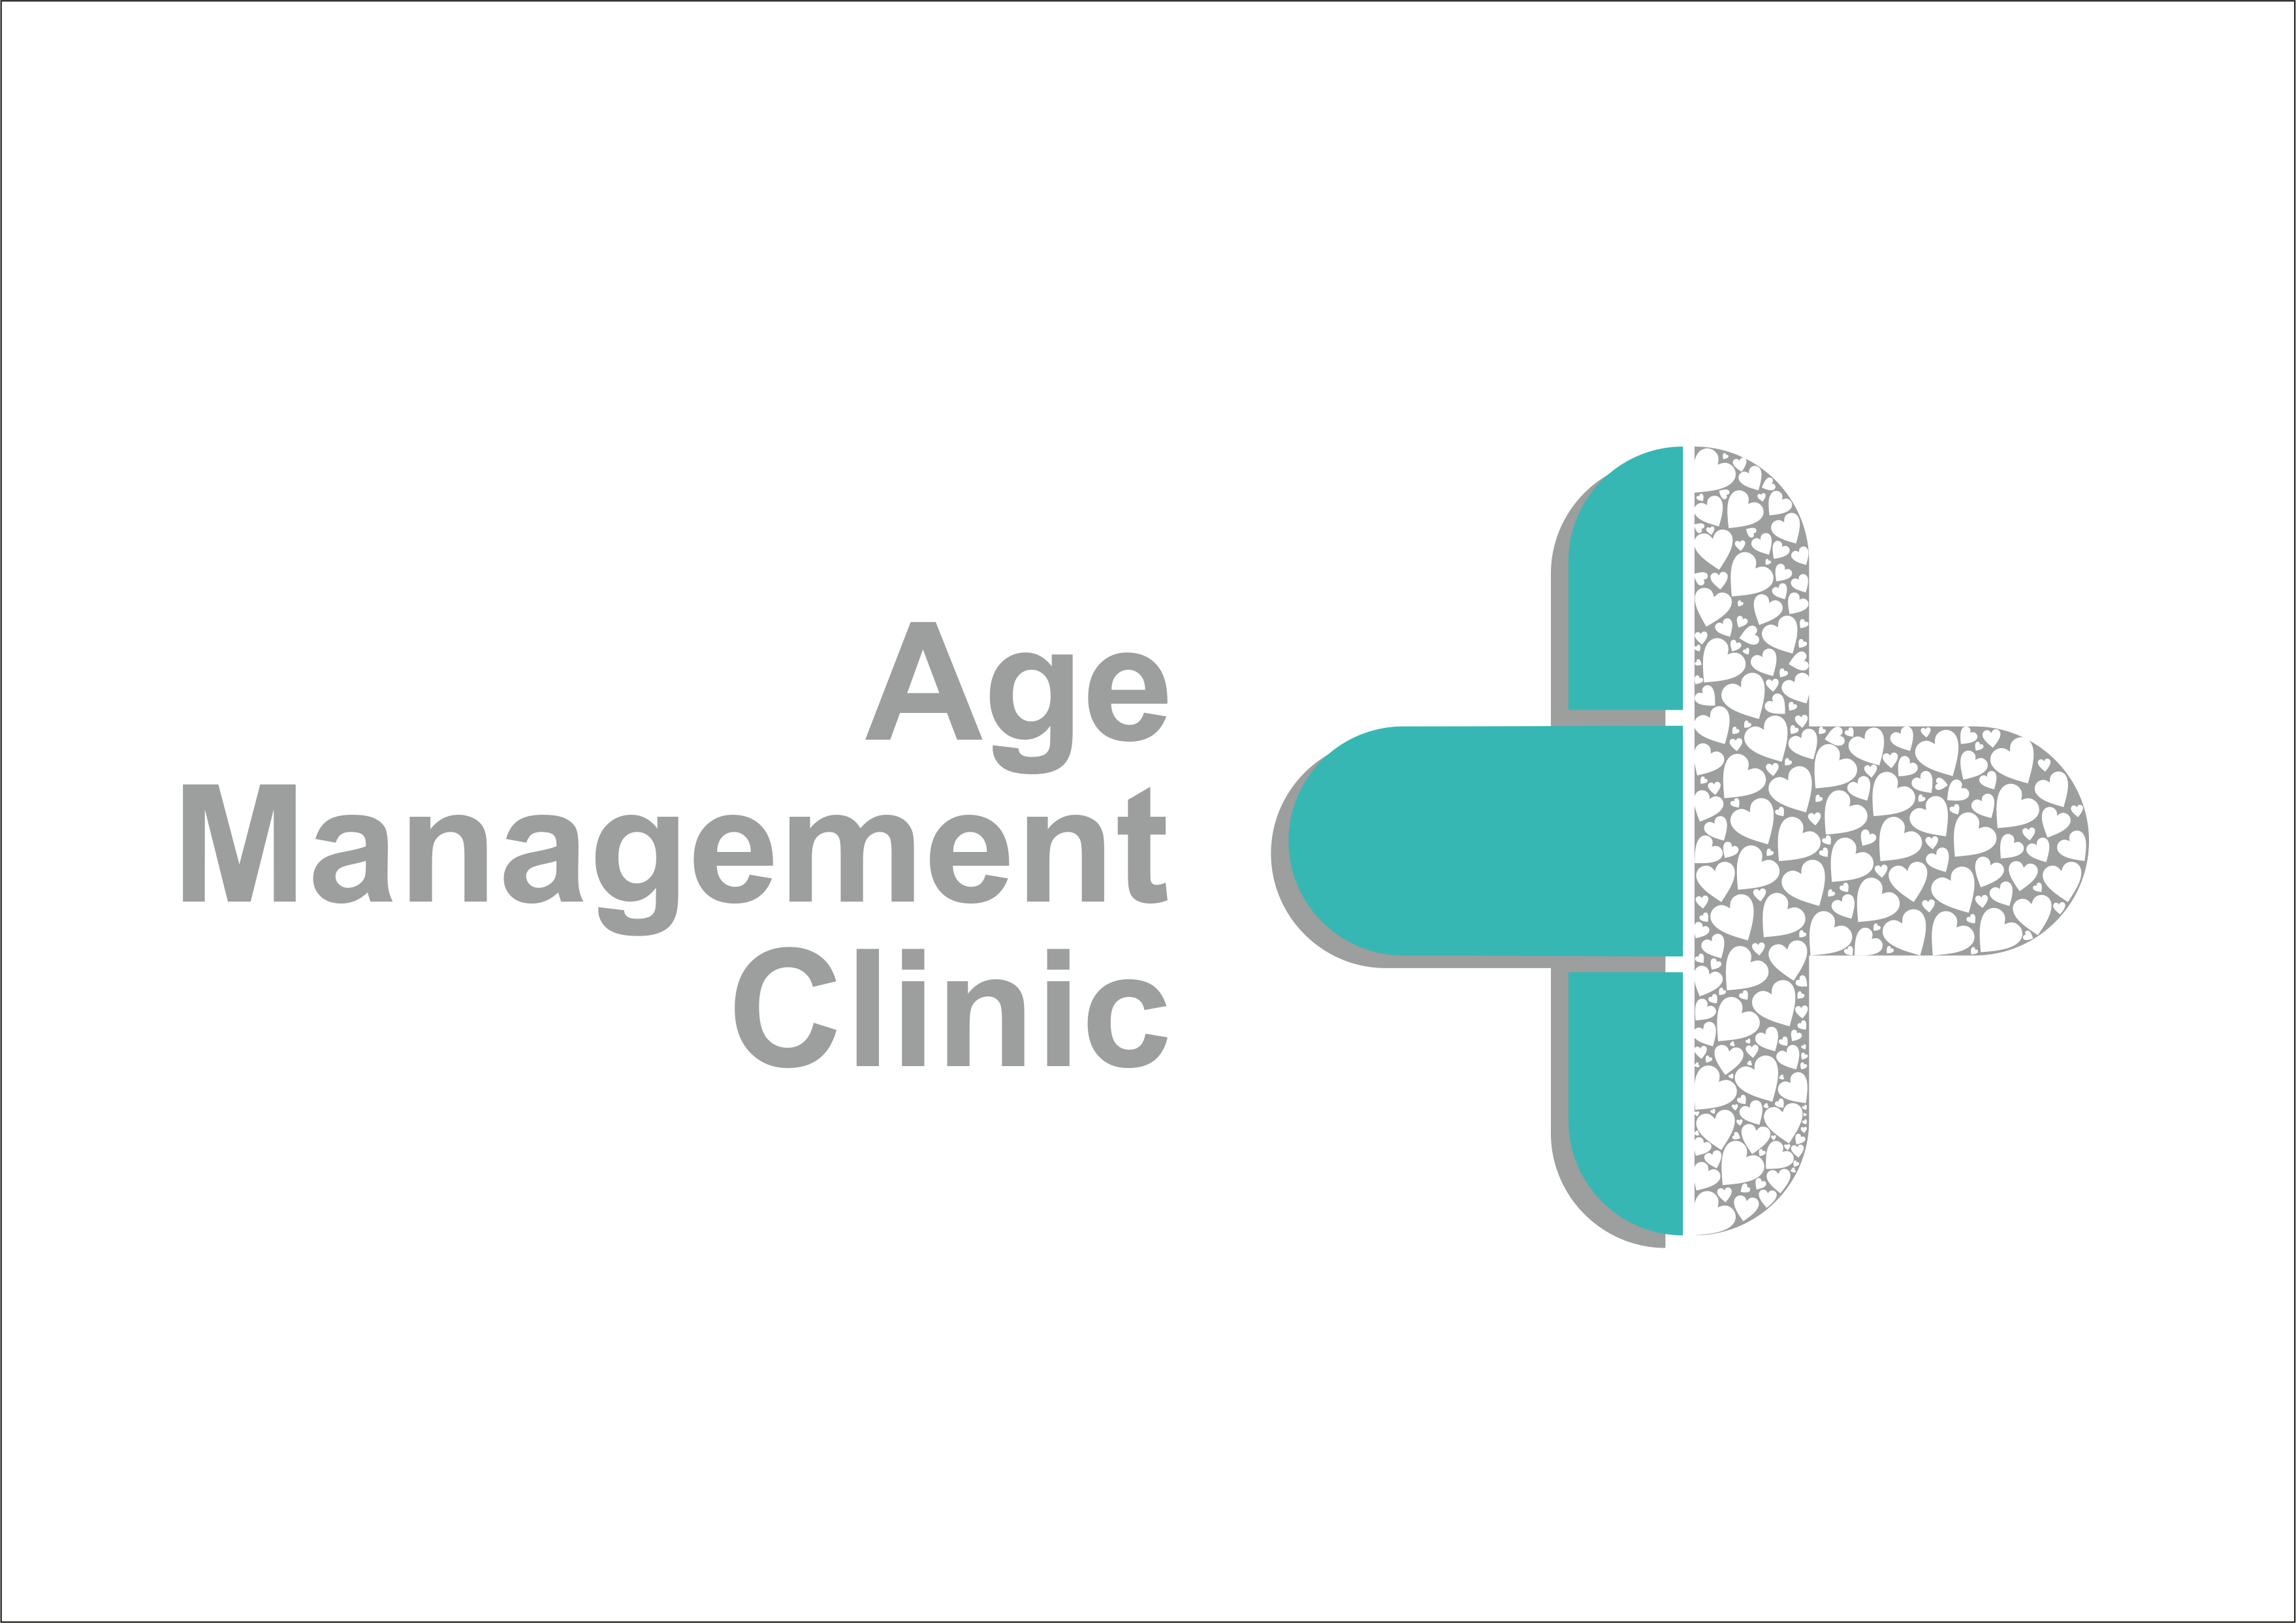 Логотип для медицинского центра (клиники)  фото f_0305b98d3c2b2f25.png